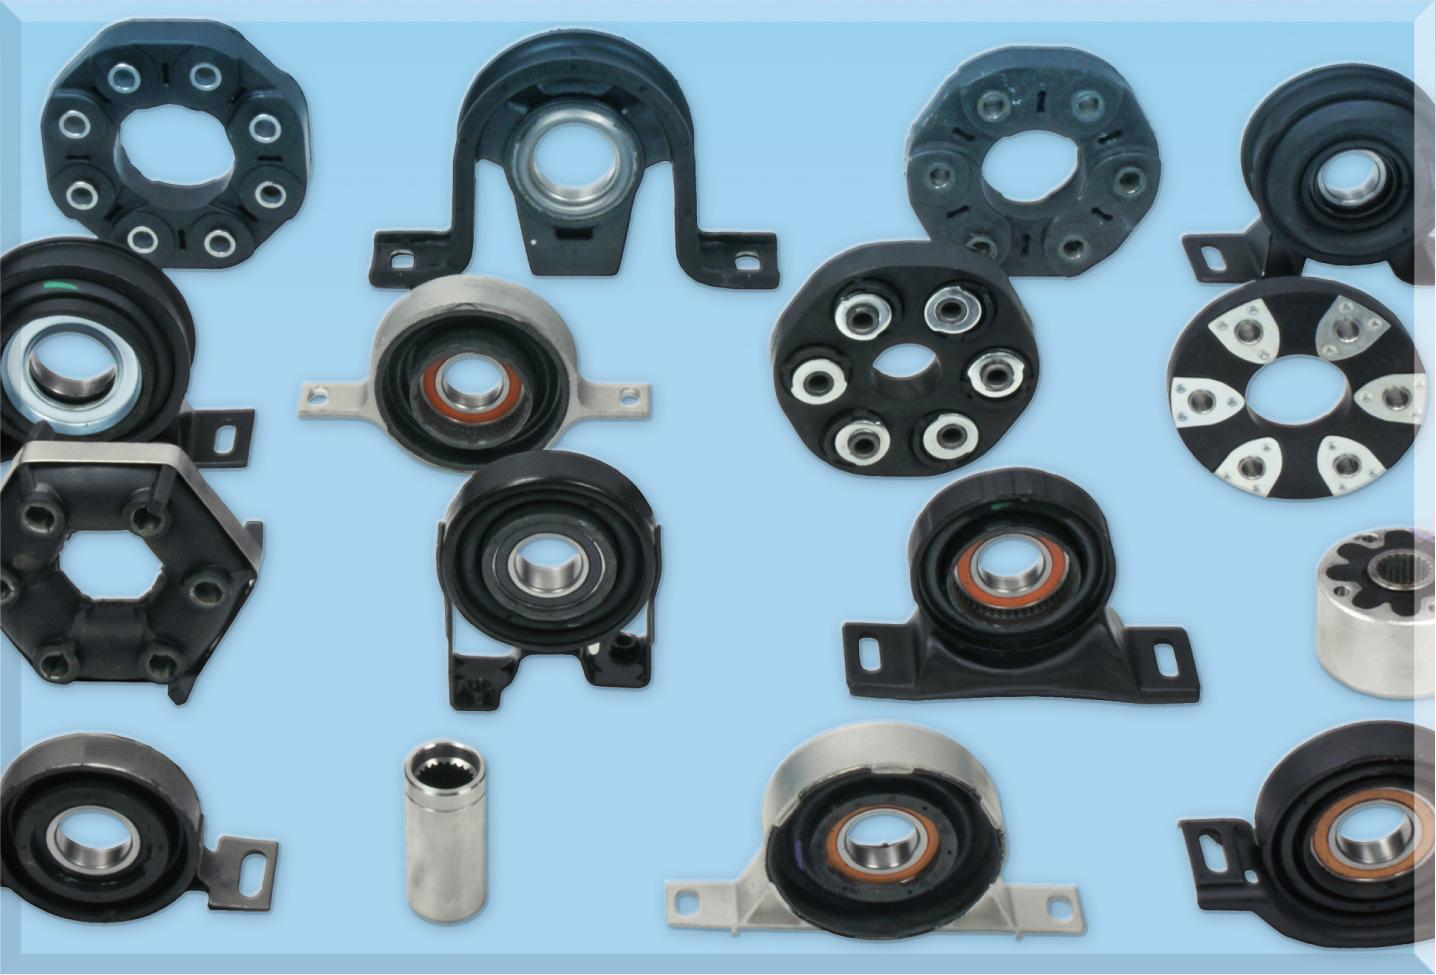 Driveshaft flex joint and Propeller Shaft Mount - UNIGOM rubber parts